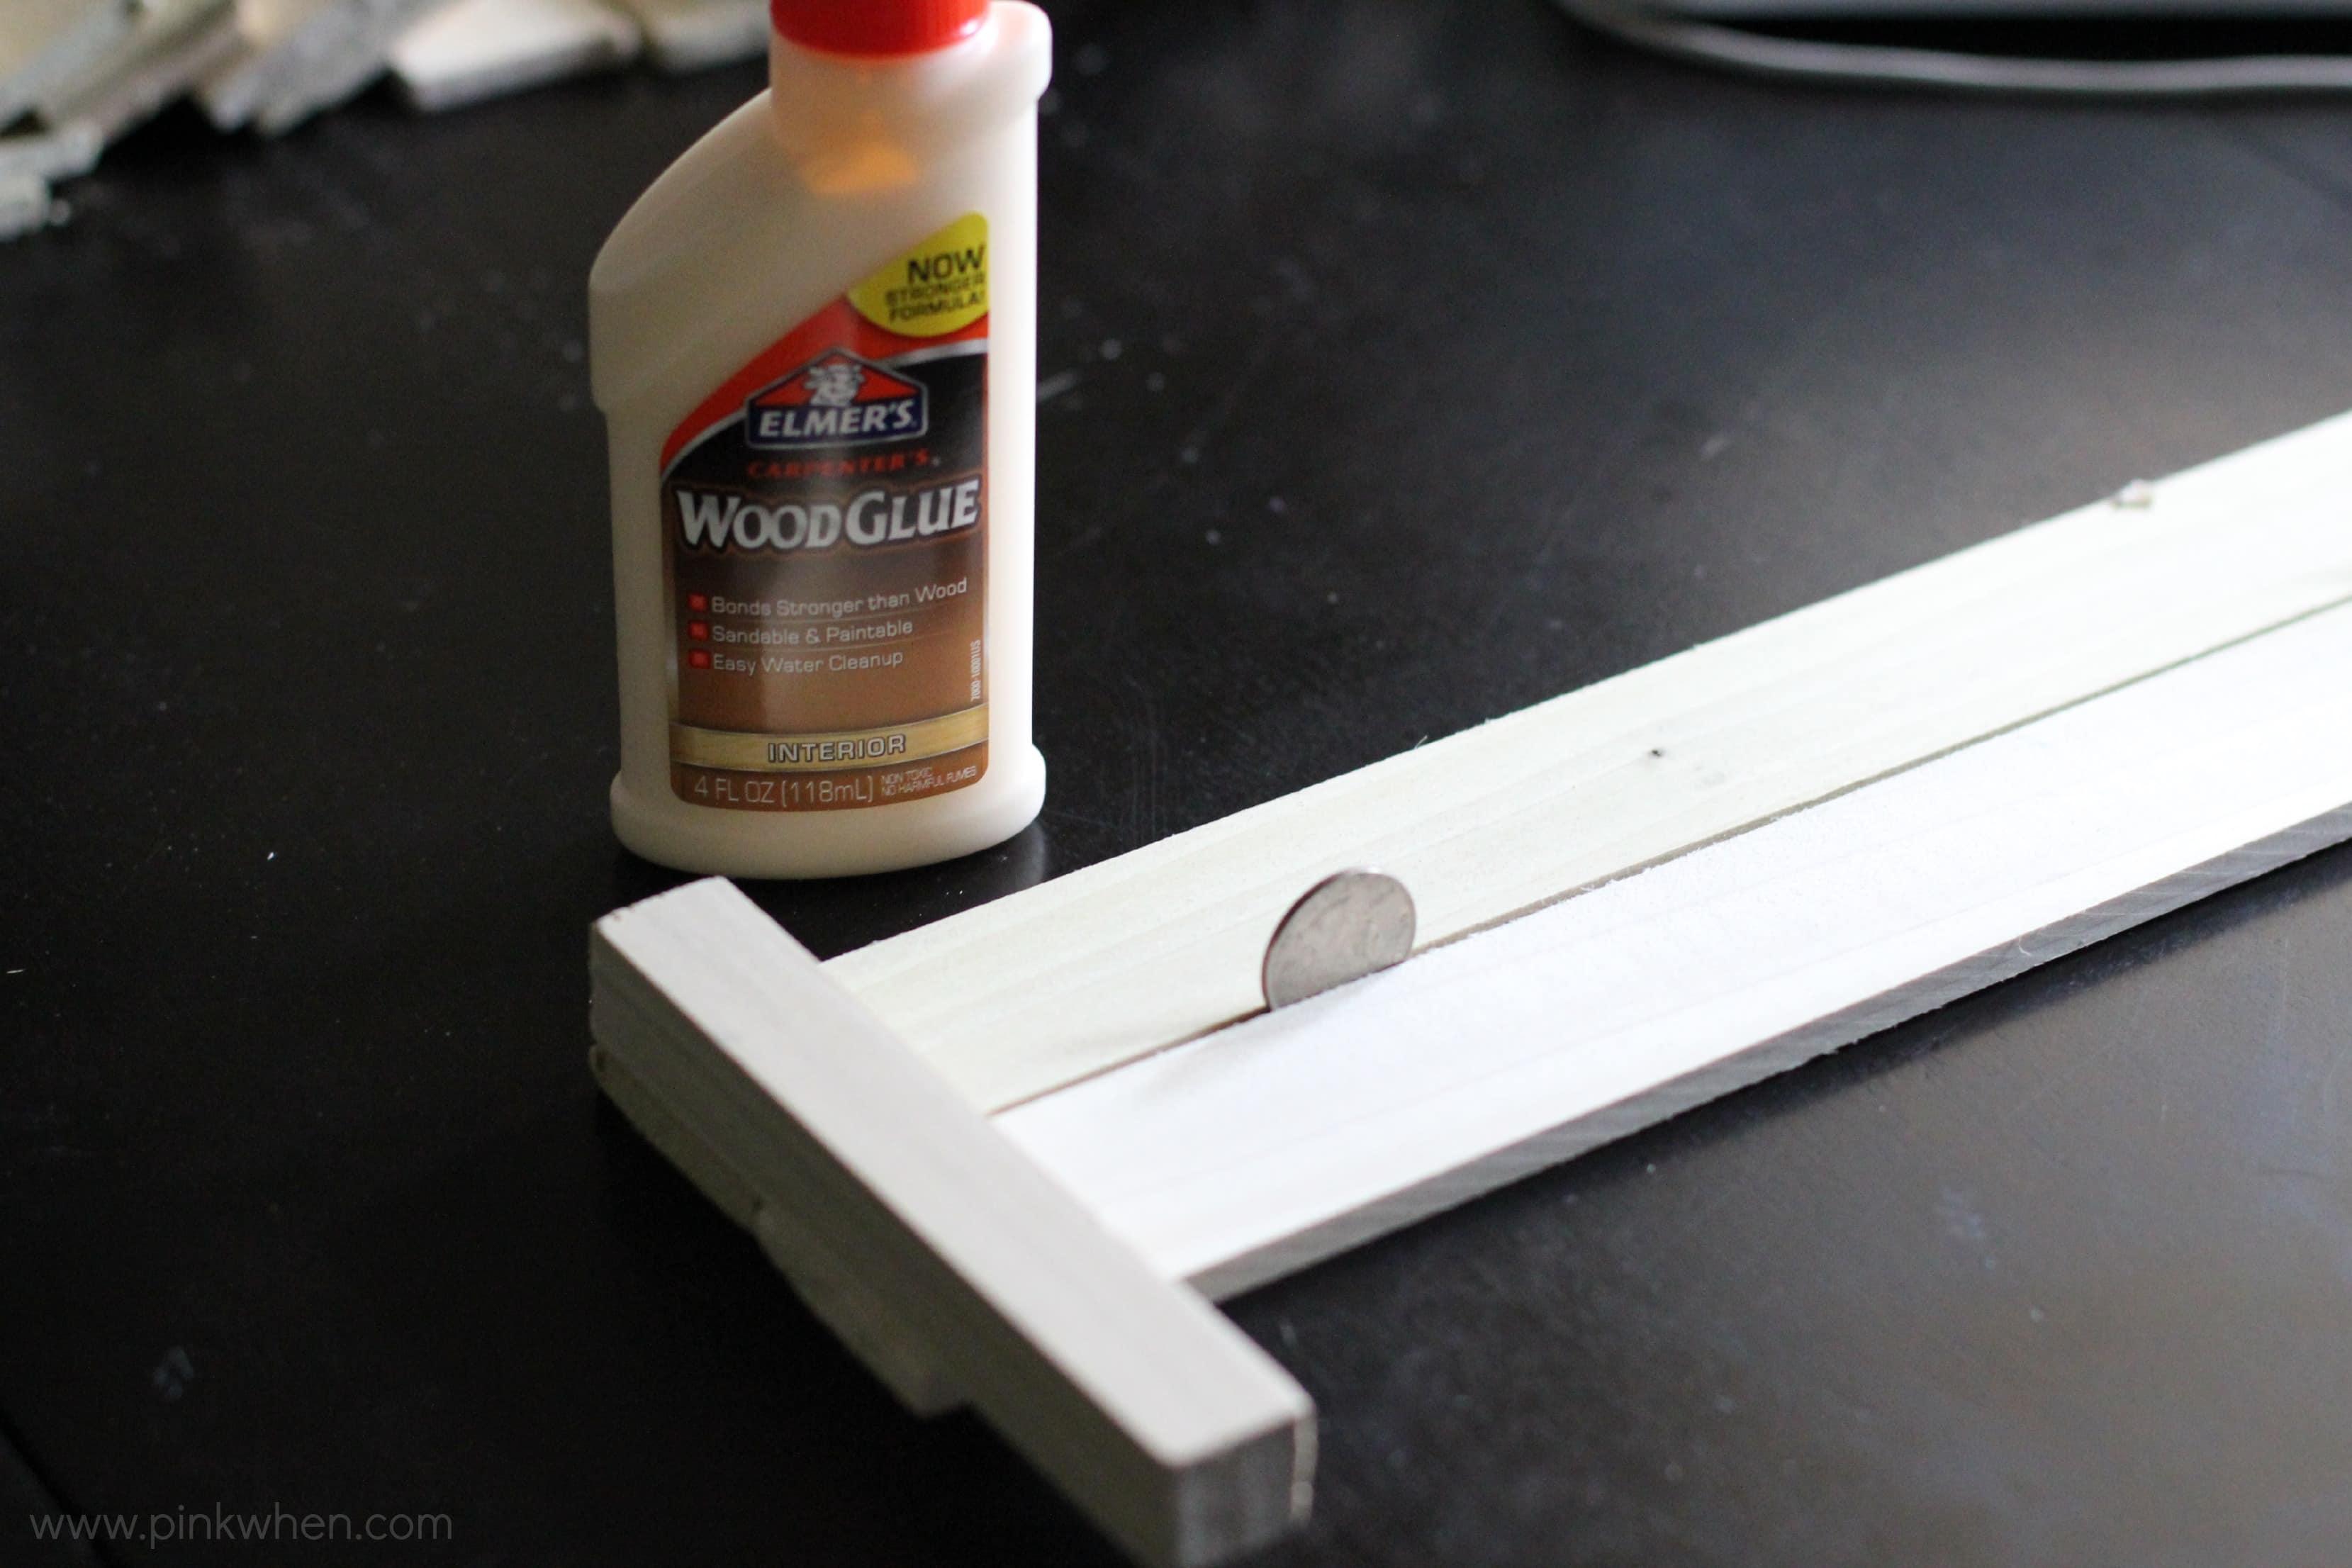 DIY Stackable Slatted Fruit Crates via PinkWhen.com